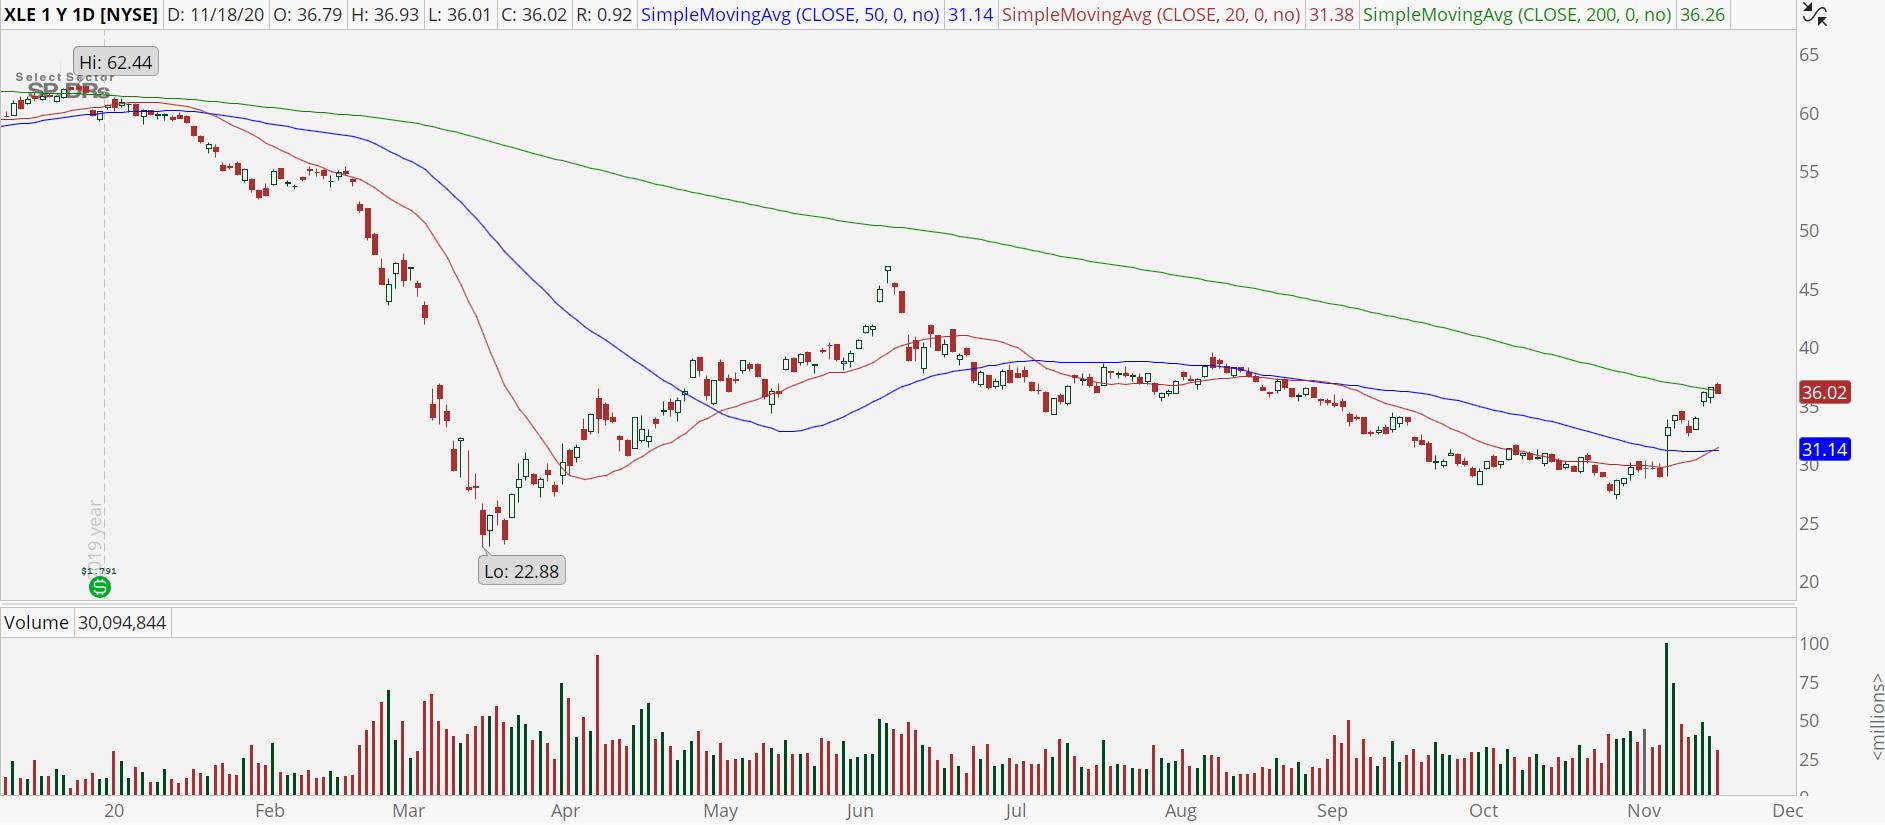 Energy Sector (XLE) chart showing bullish trend reversal